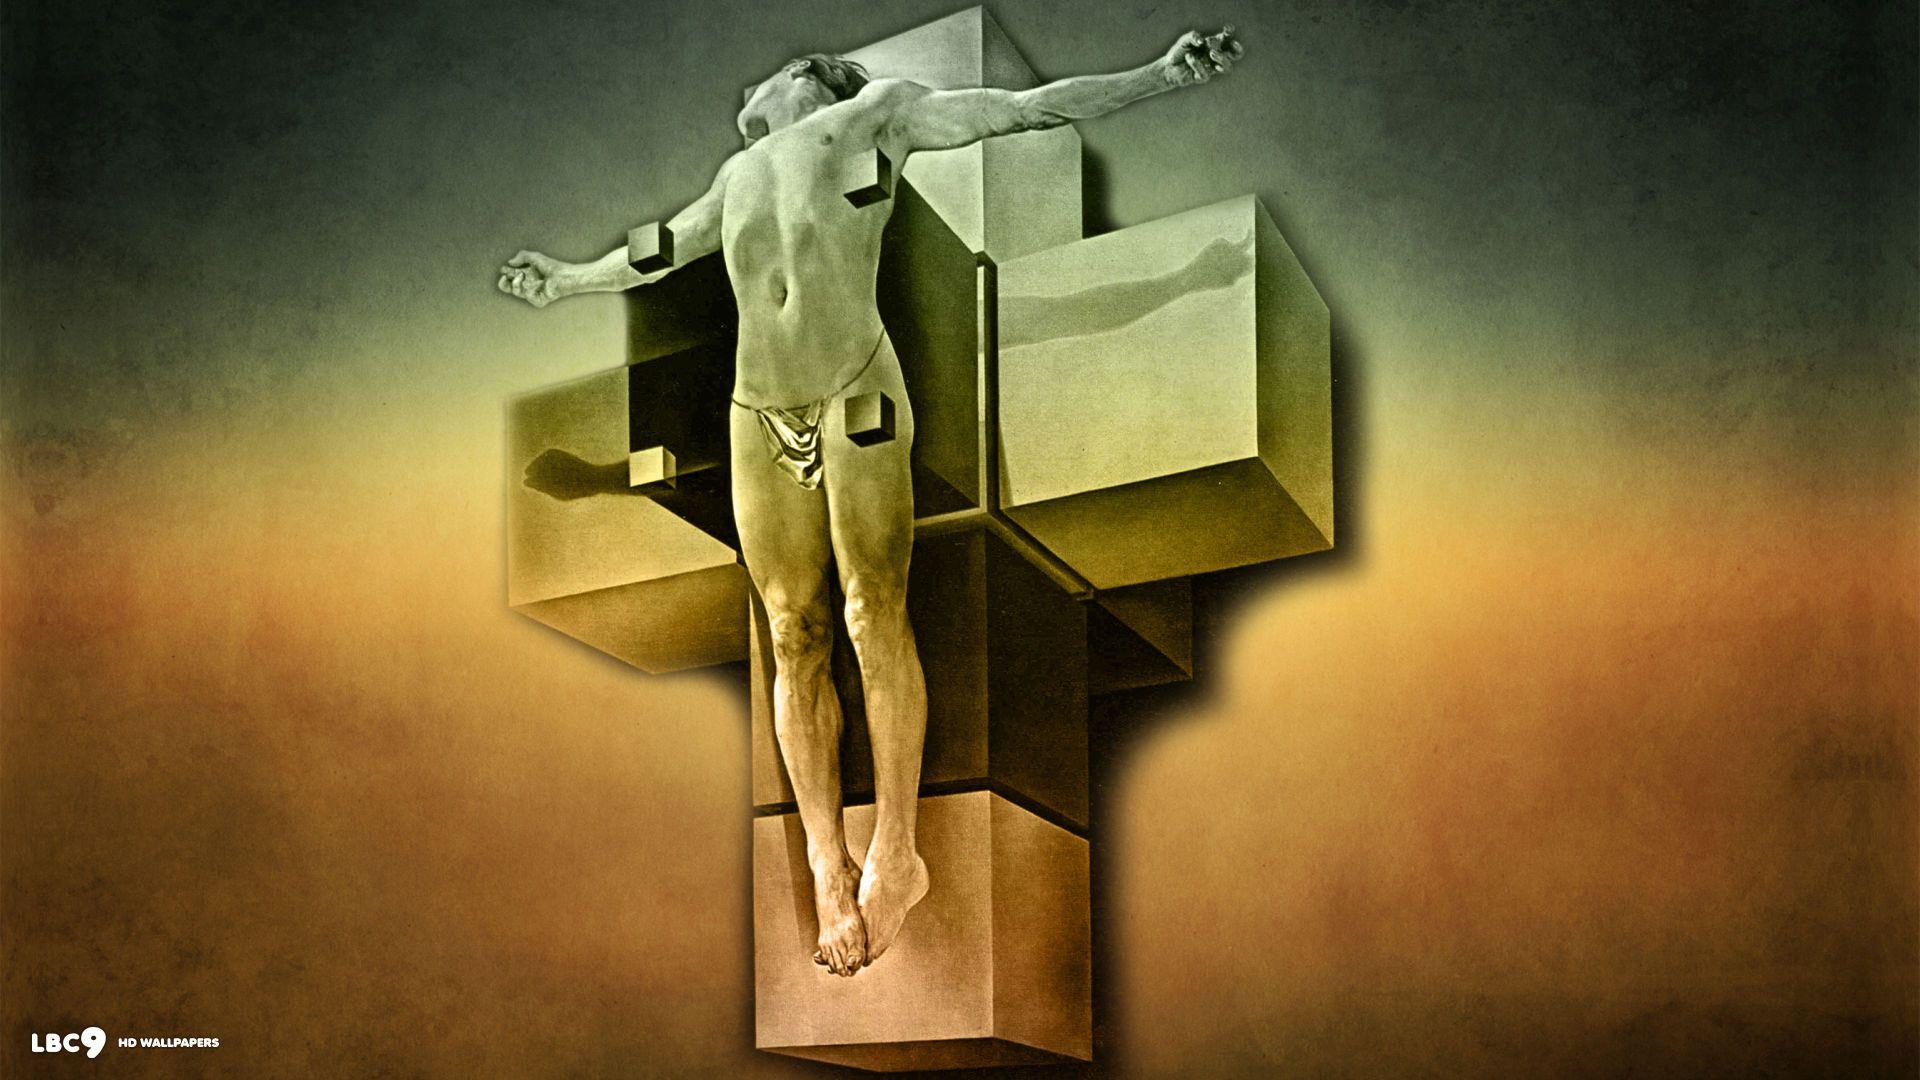 Salvador Dali Wallpapers And Paintings Hd Backgrounds Salvador Dali Salvador Dali Artwork Salvador Dali Art